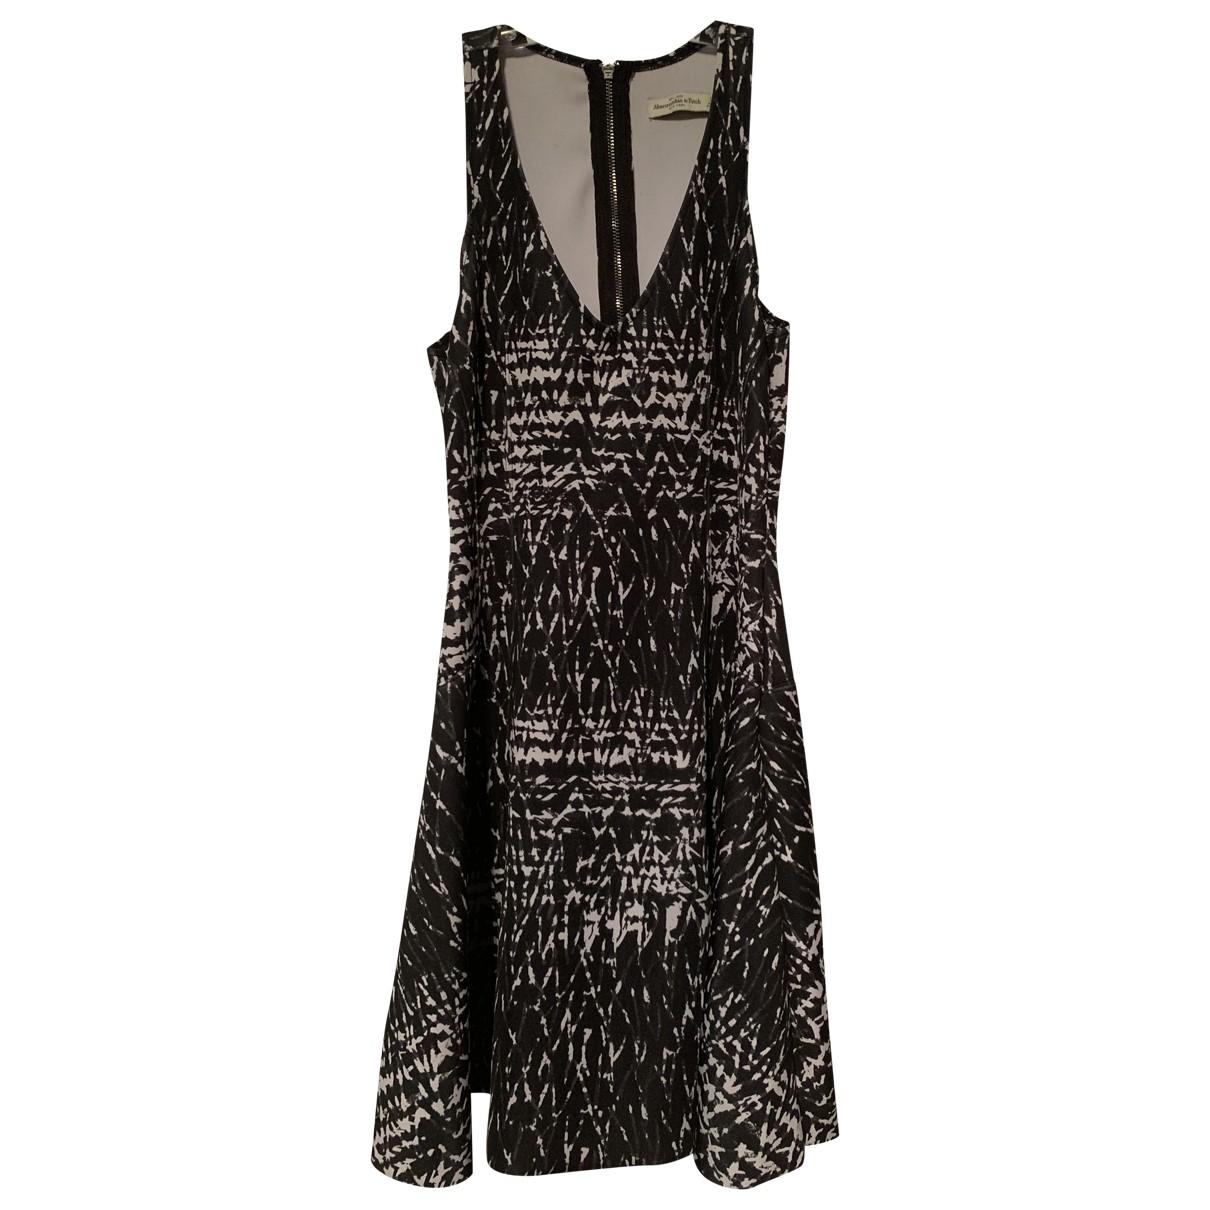 Abercrombie & Fitch - Robe   pour femme - multicolore